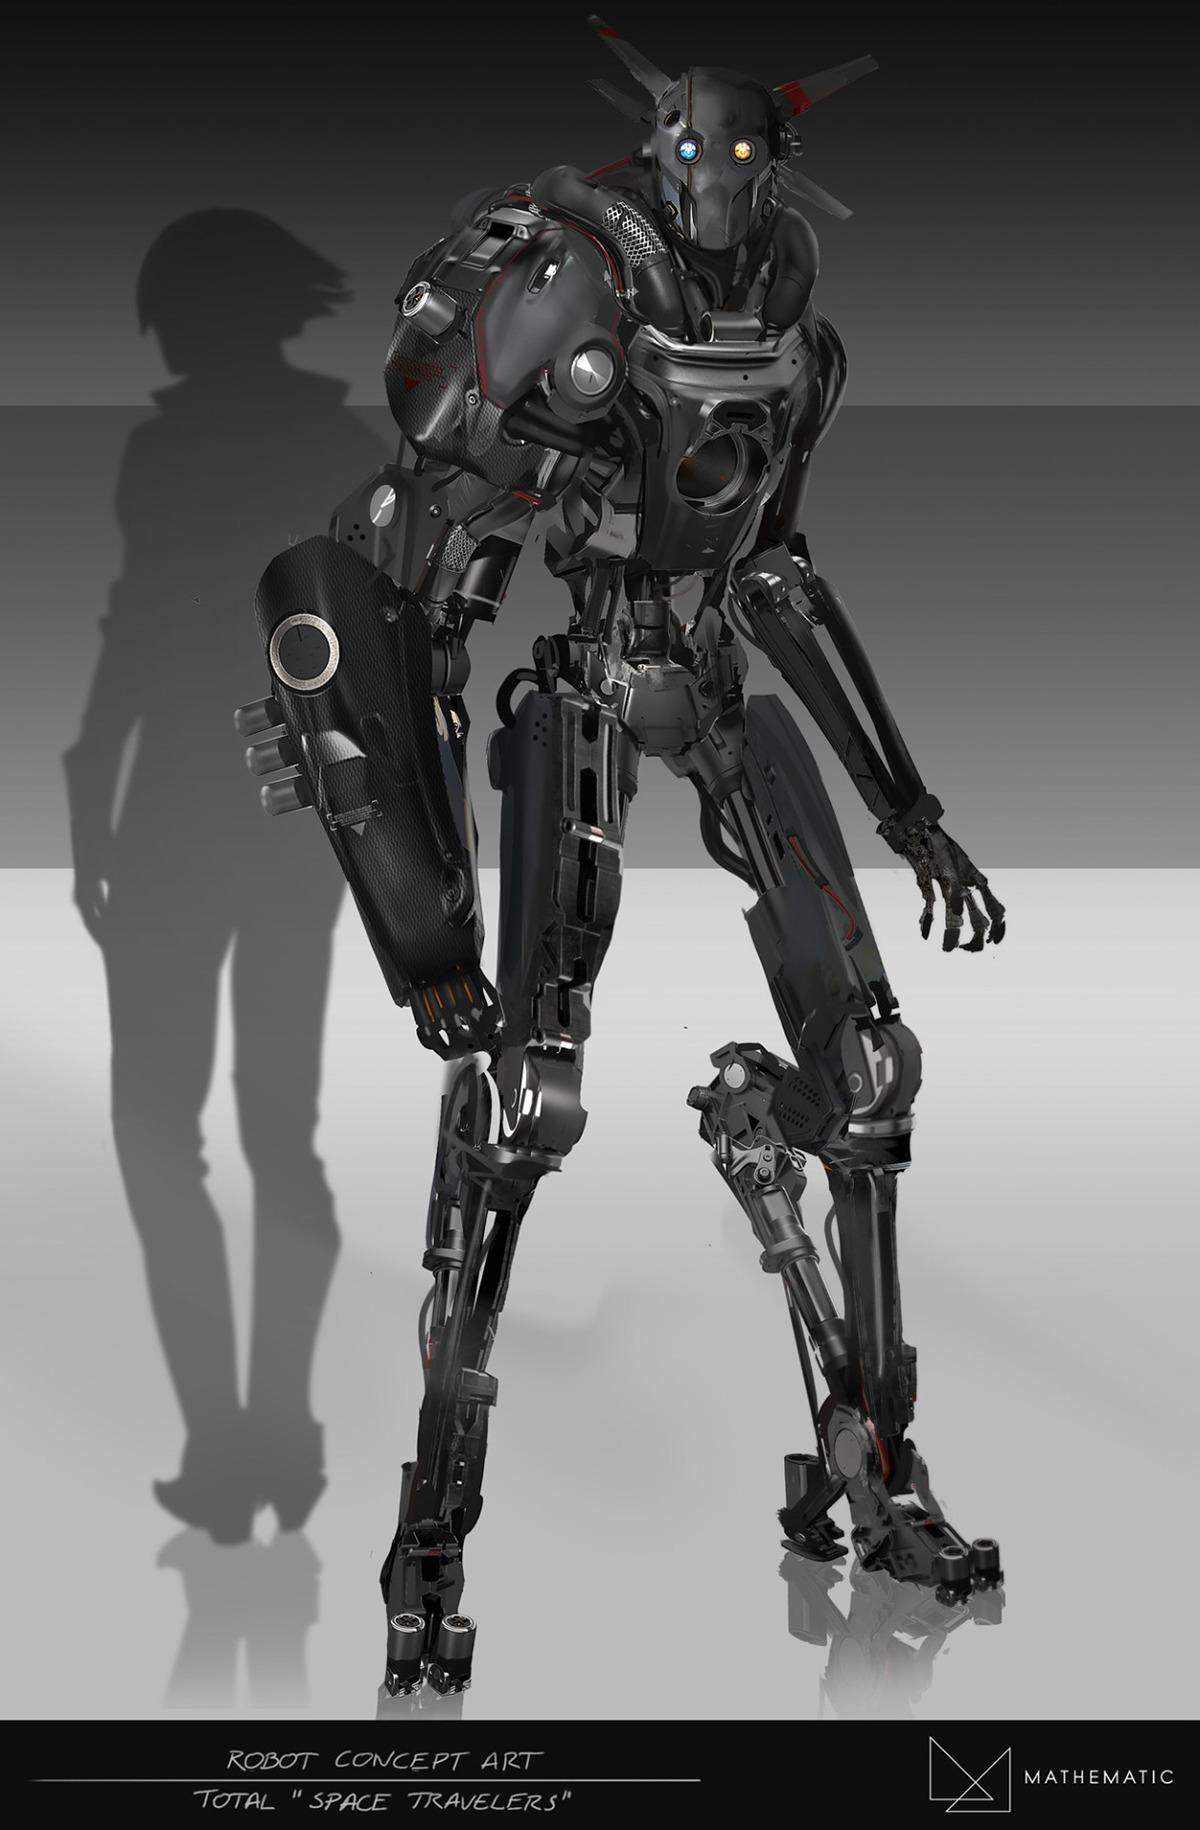 Robot Concept Art Total Advertising On Behance